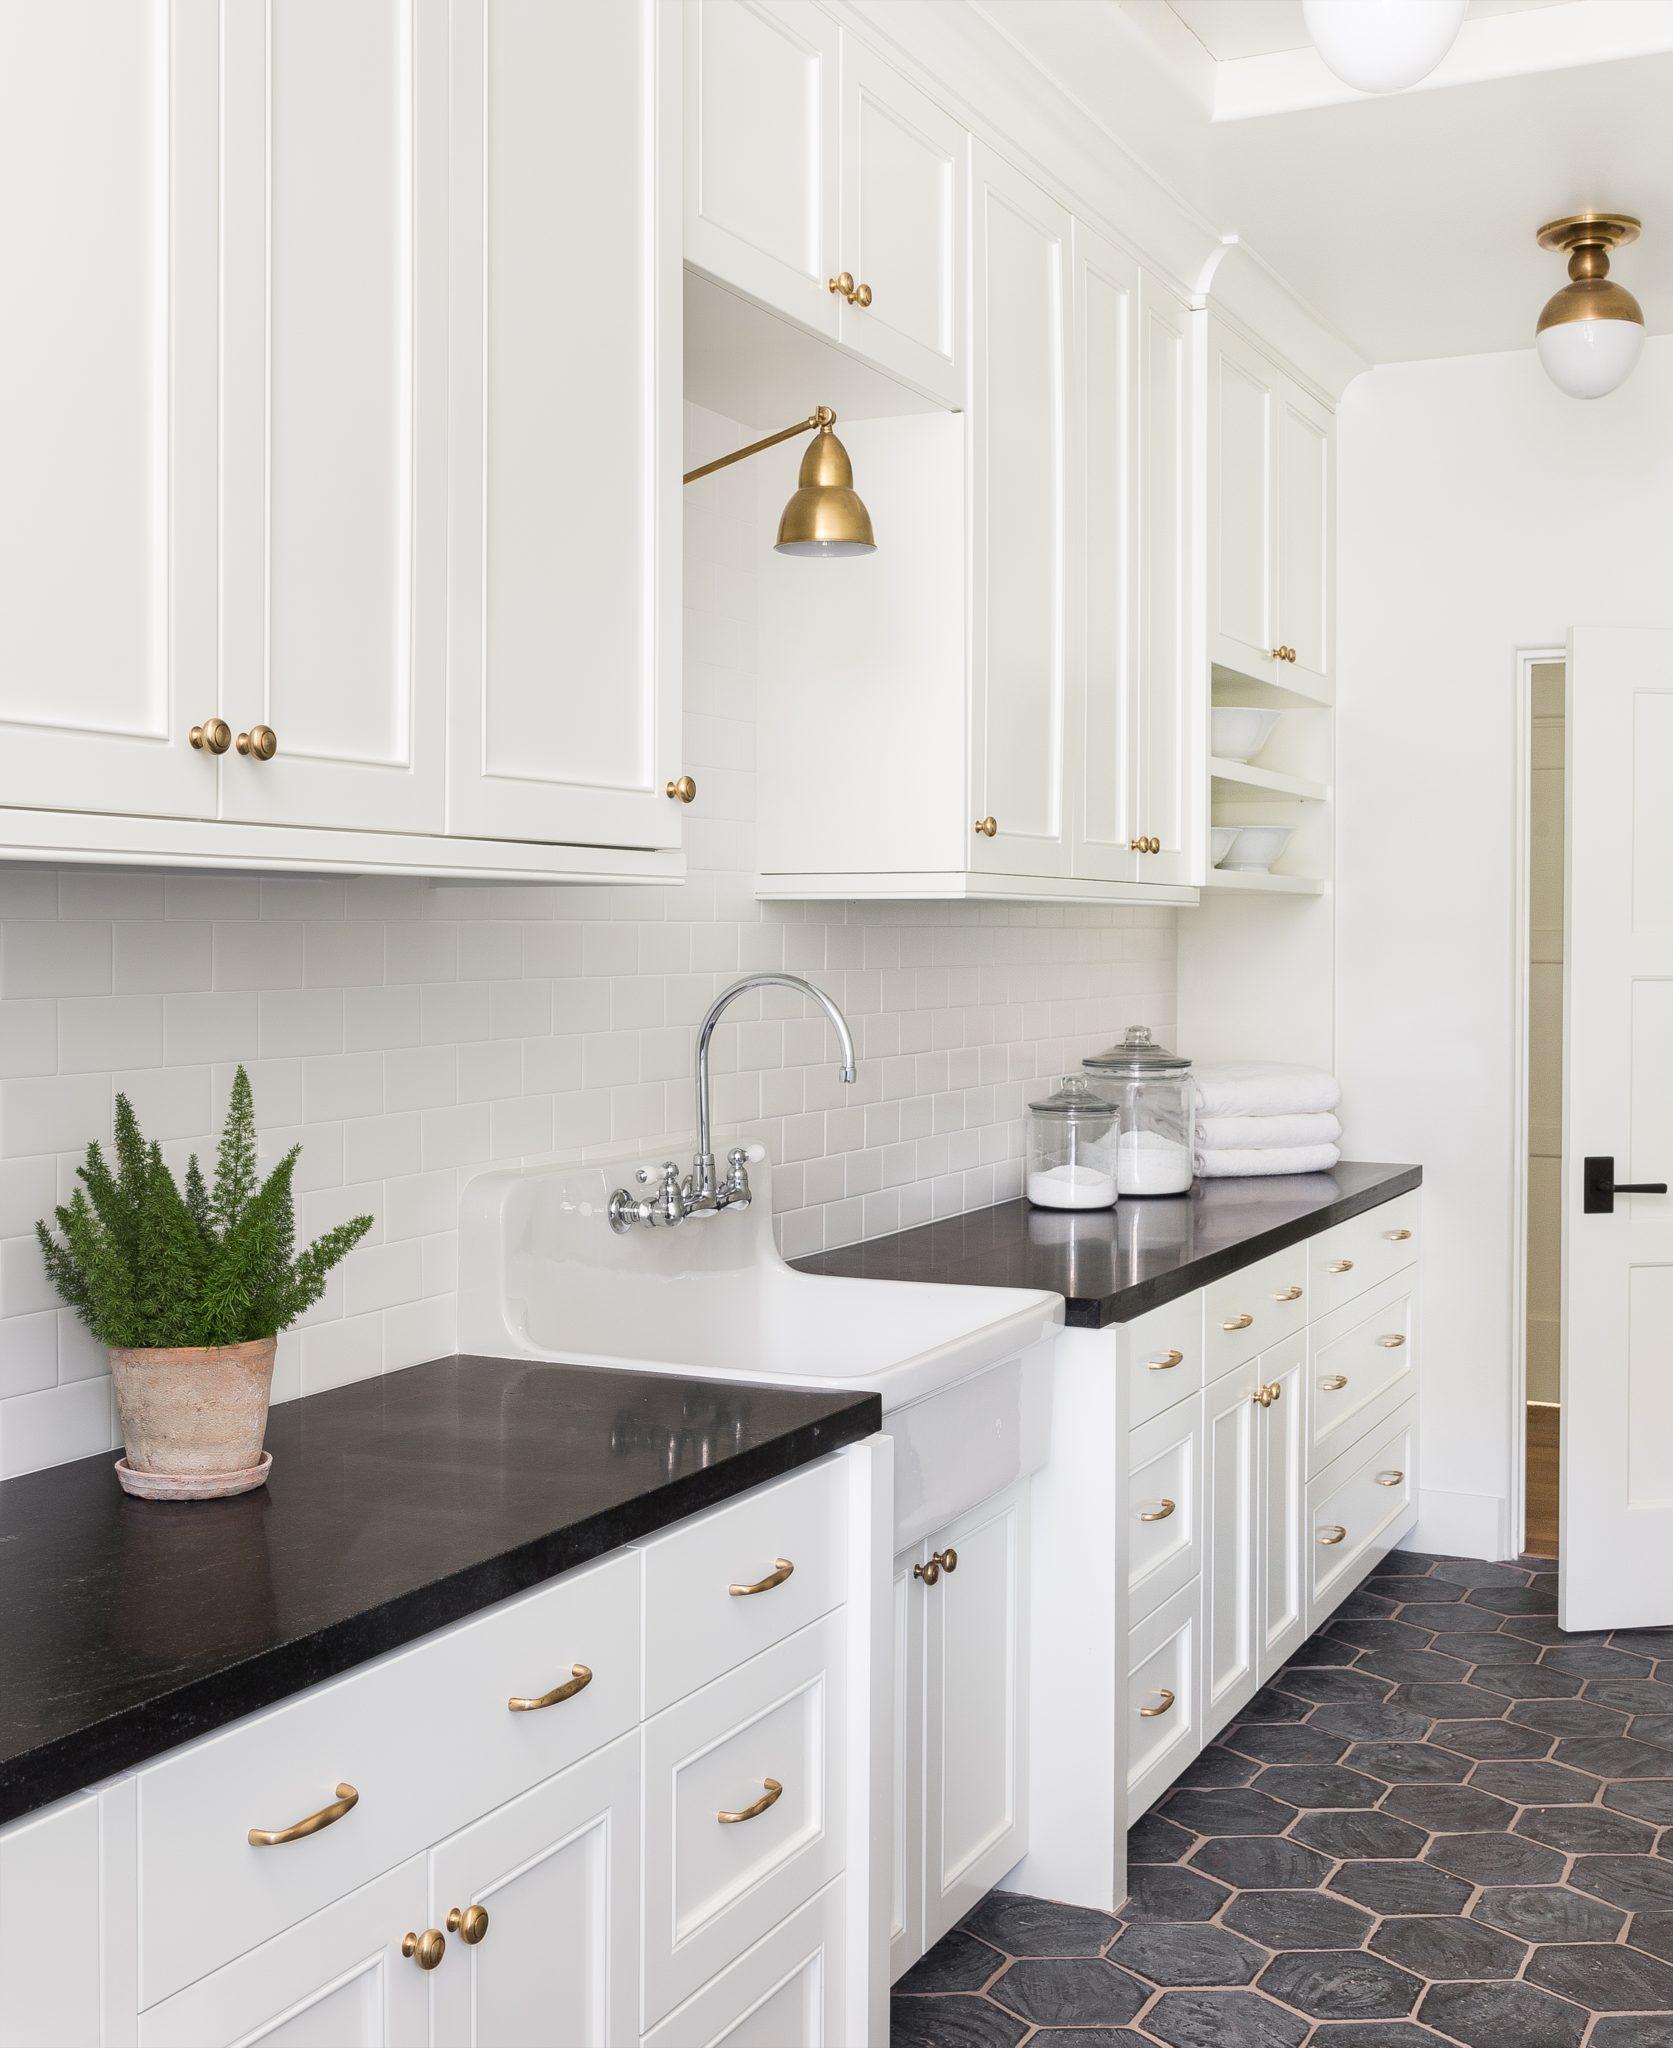 California, Laundry Room by Marianne Simon Design